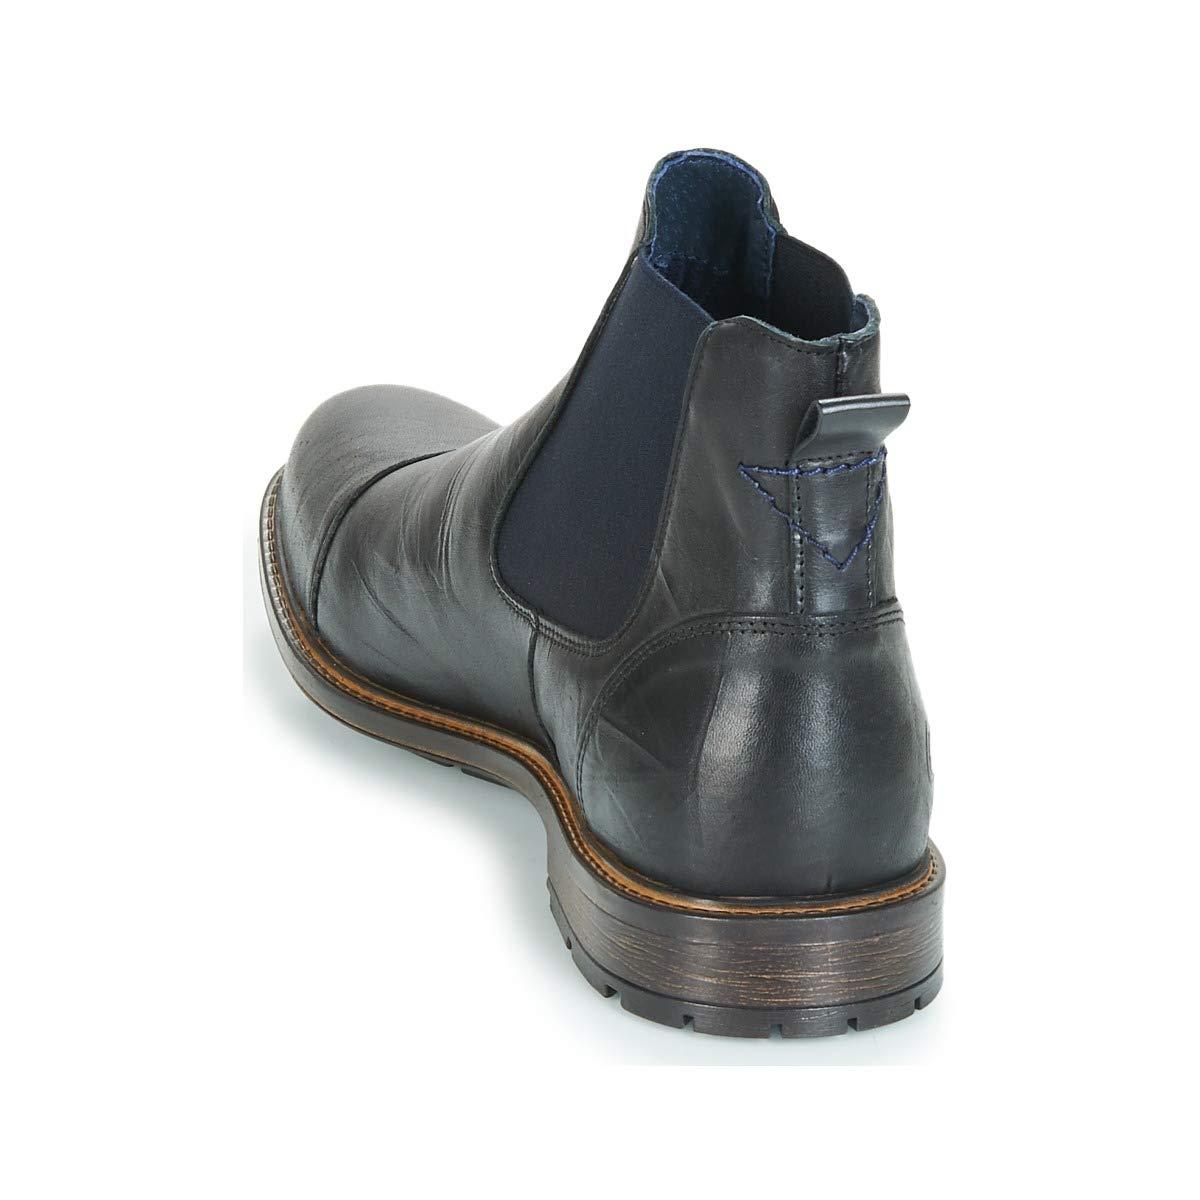 Casual Casual Casual Attitude JINZA Stiefelletten Stiefel Herren Grau Stiefel 617c83